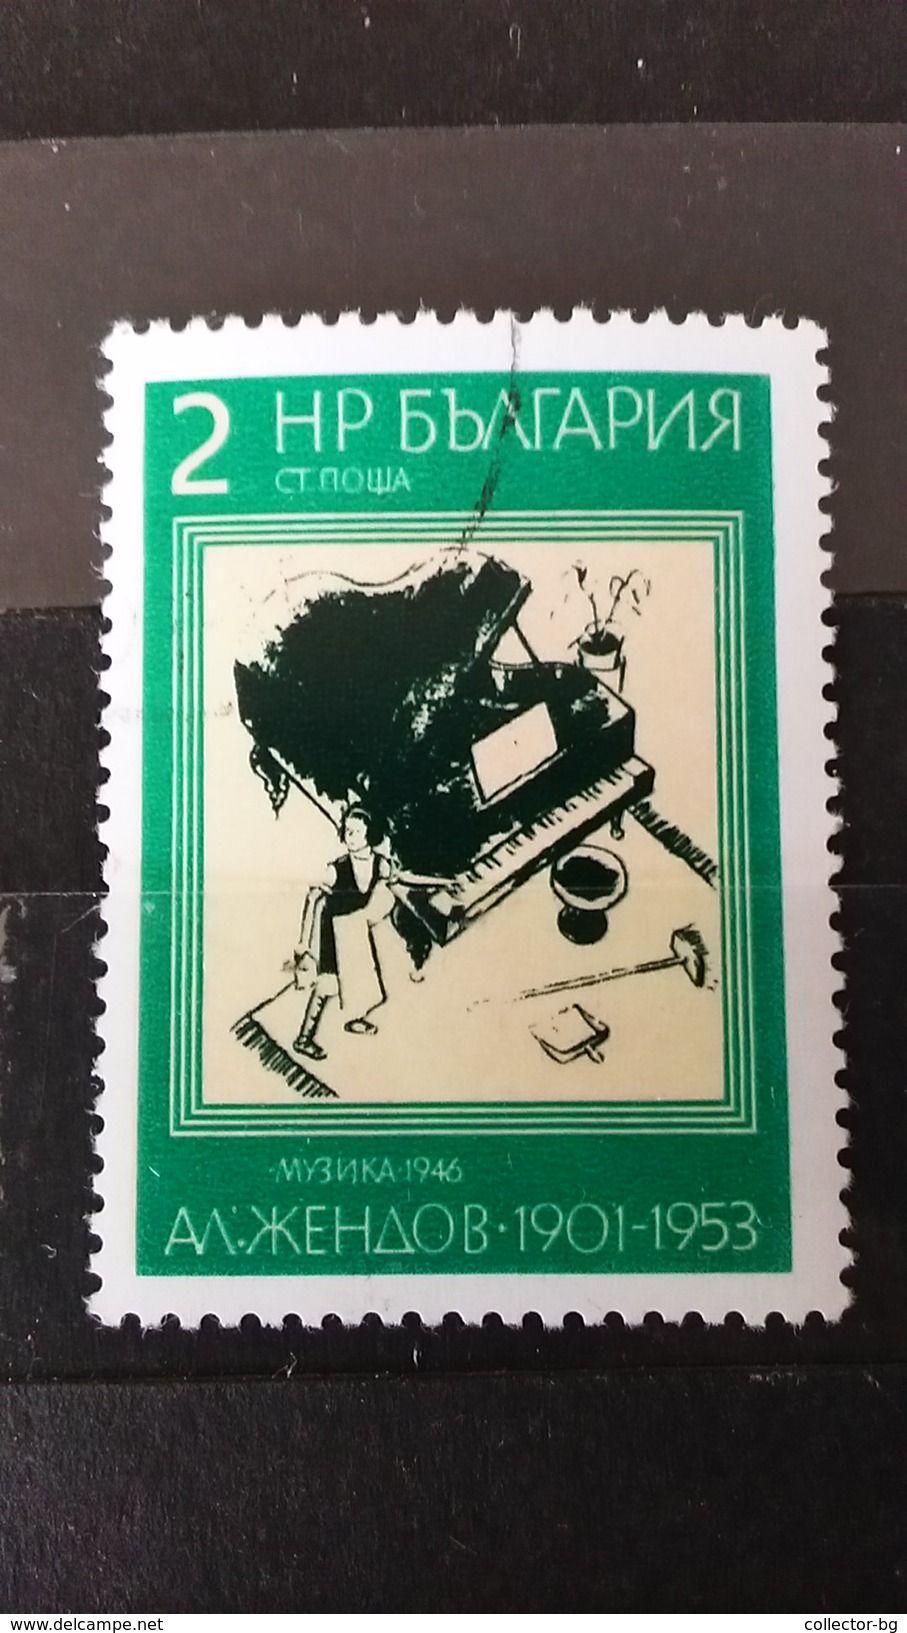 RARE 2 STOTINKI MUSIC JENDOV 1901-1953 BULGARIA  UNUSED/MINT STAMP TIMBRE - 1945-59 People's Republic